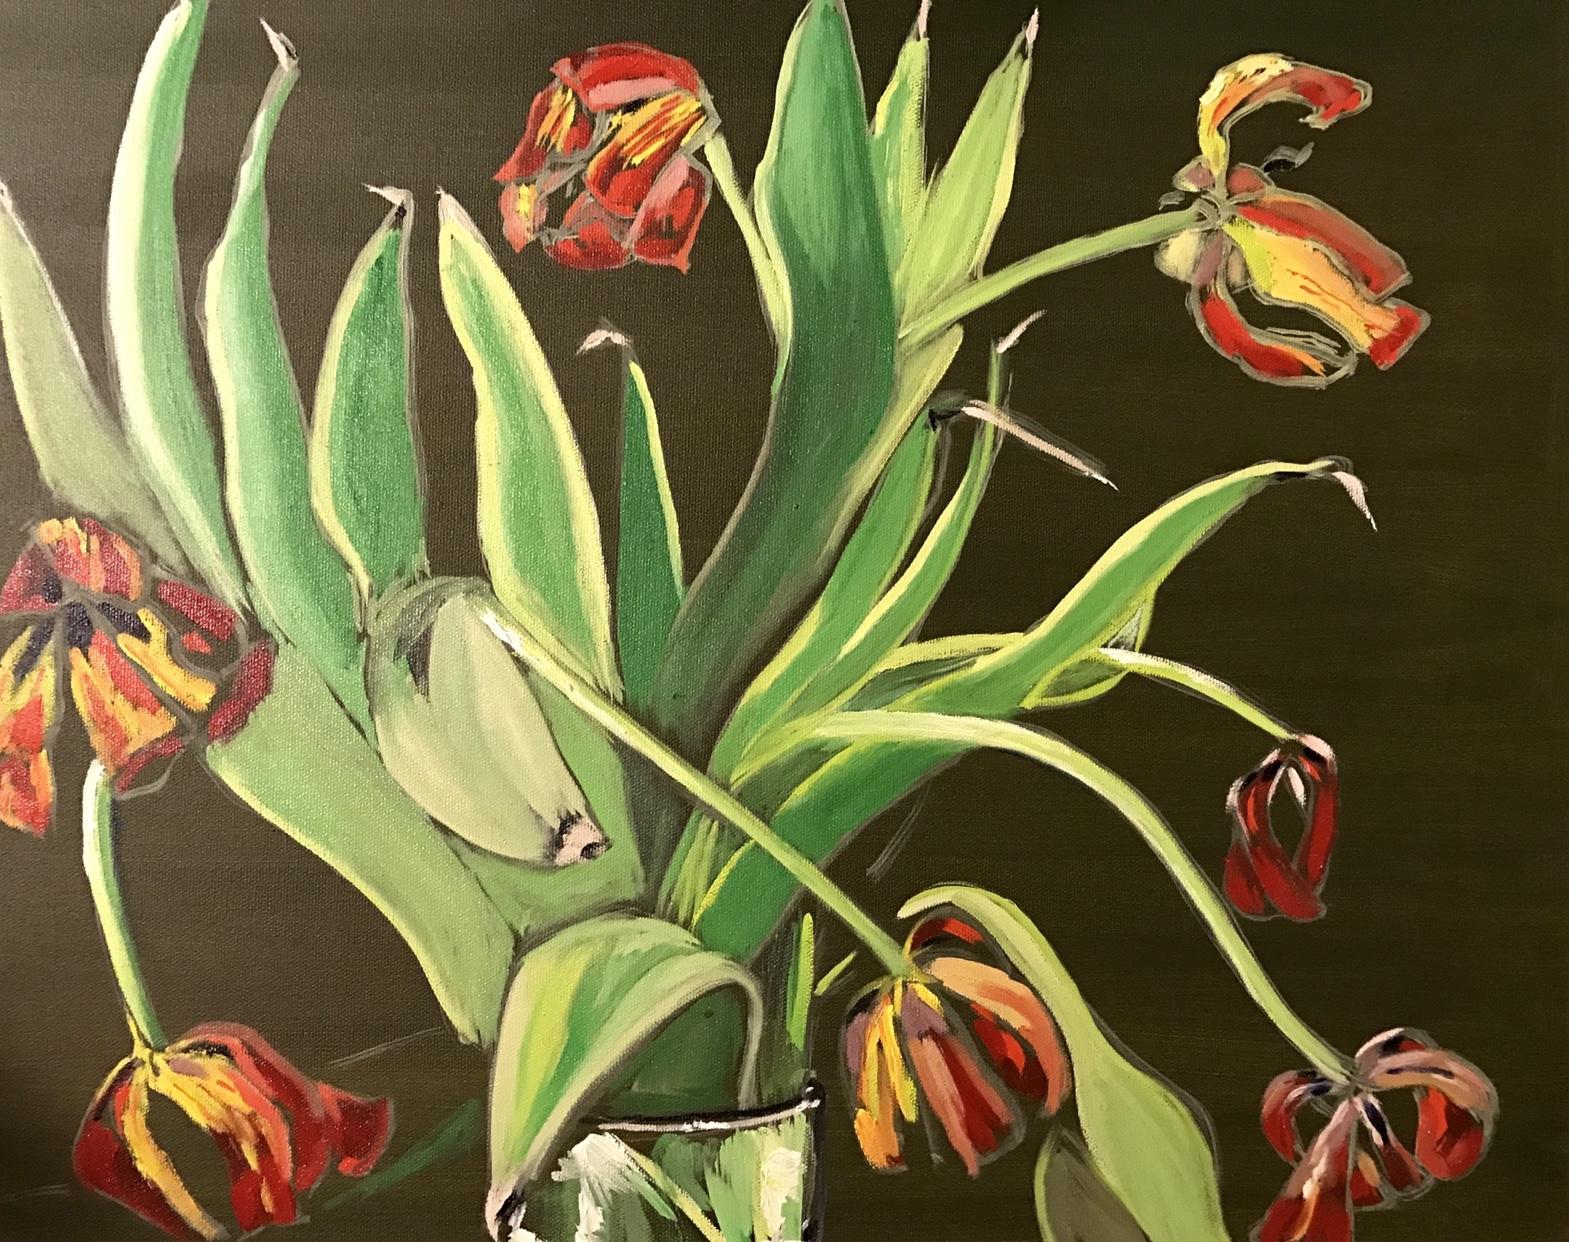 Susan-Darwin-Artist-Dead-Tulips.jpeg